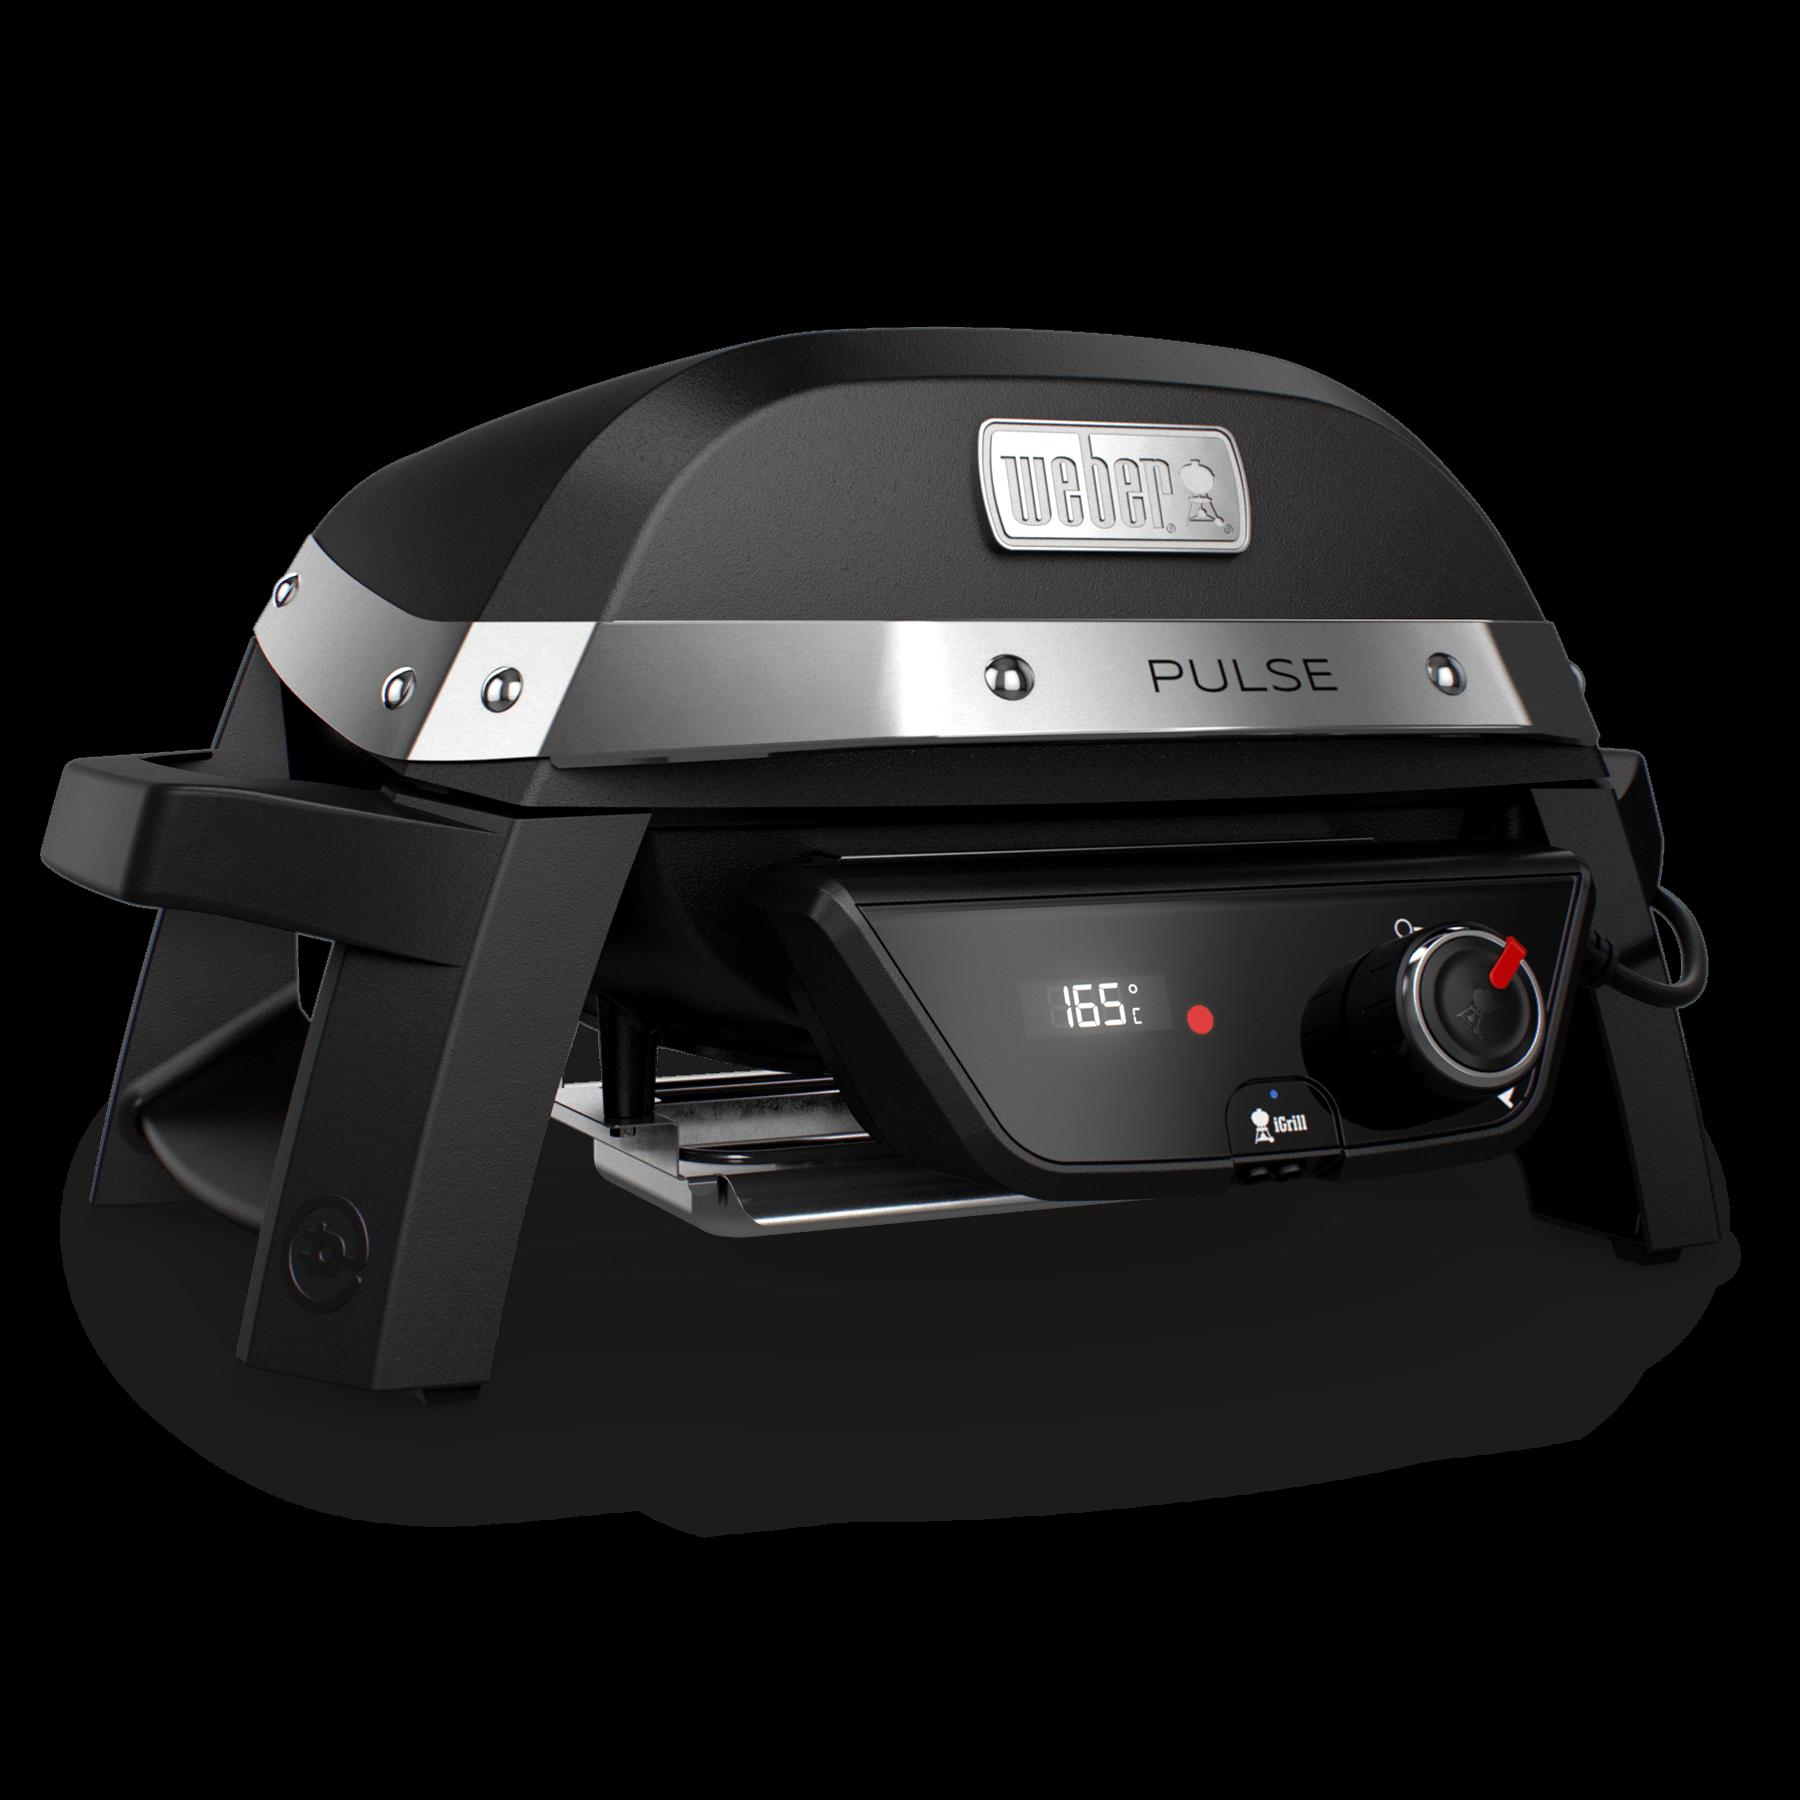 pulse 1000 elektrische barbecue weber grill original. Black Bedroom Furniture Sets. Home Design Ideas